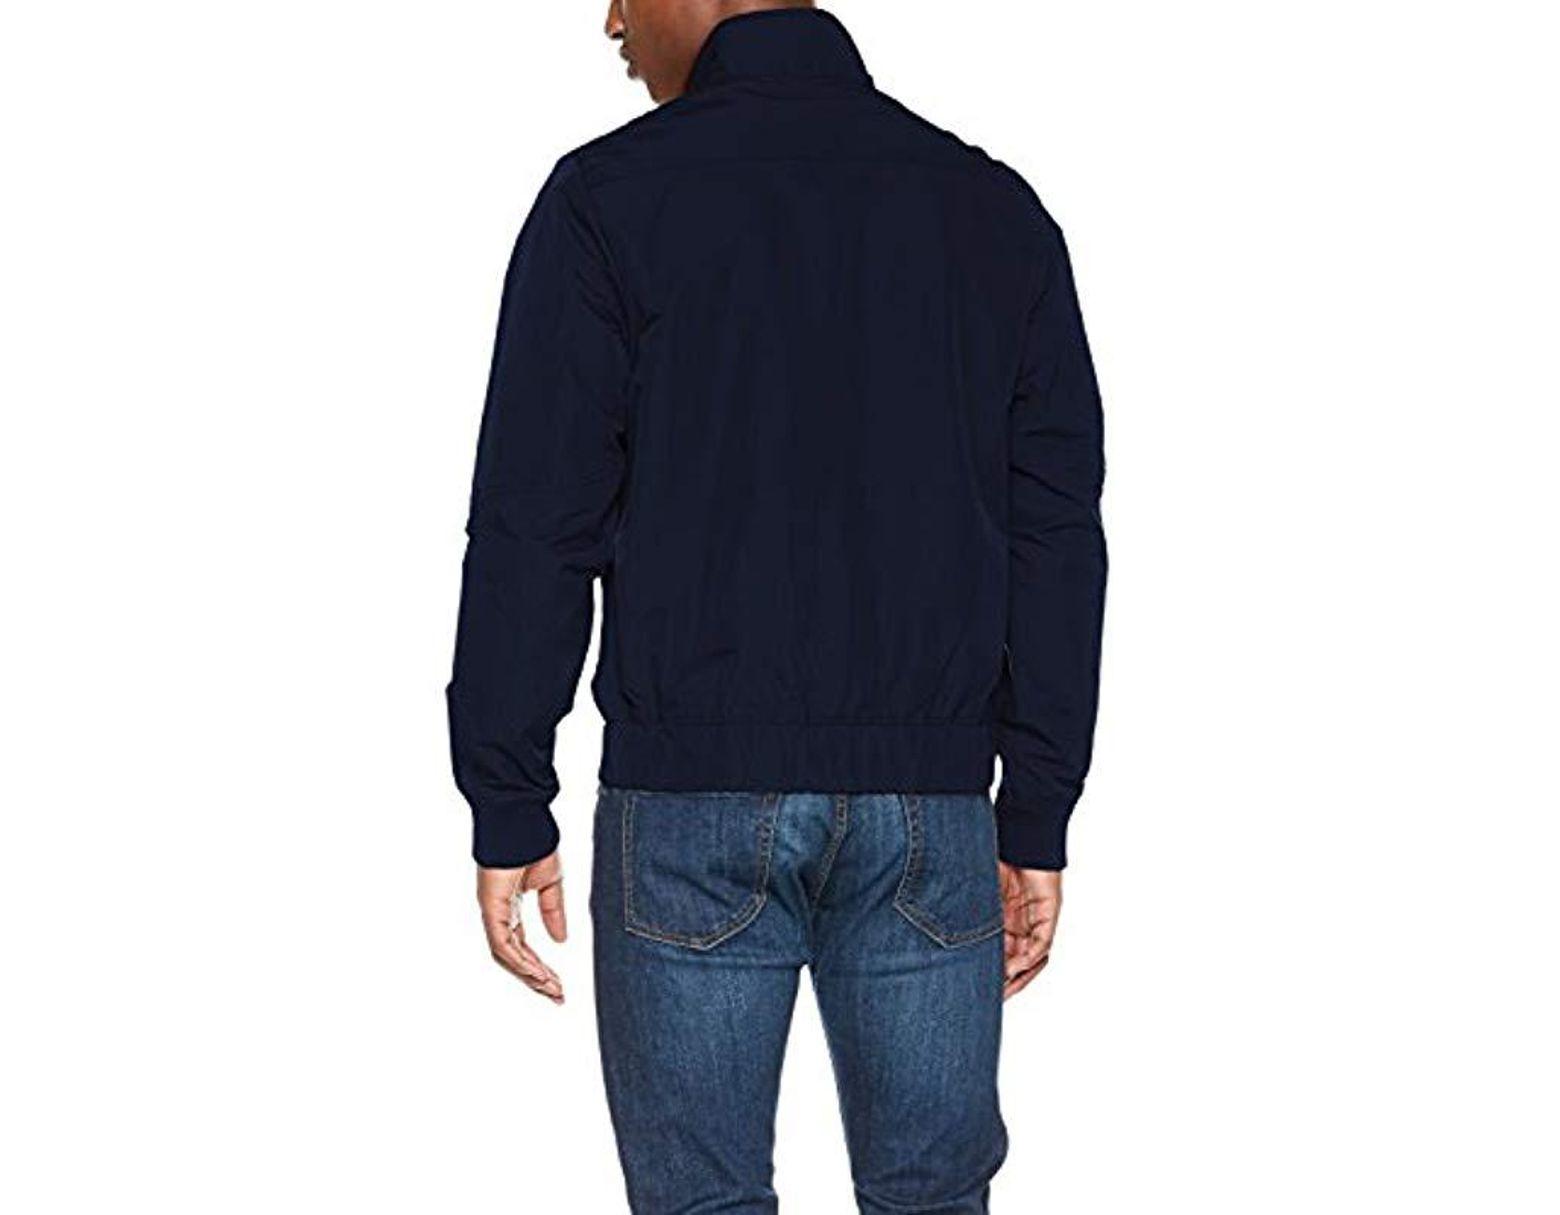 e6d439b09 Men's Blue Deline Track Overshirt Jacket